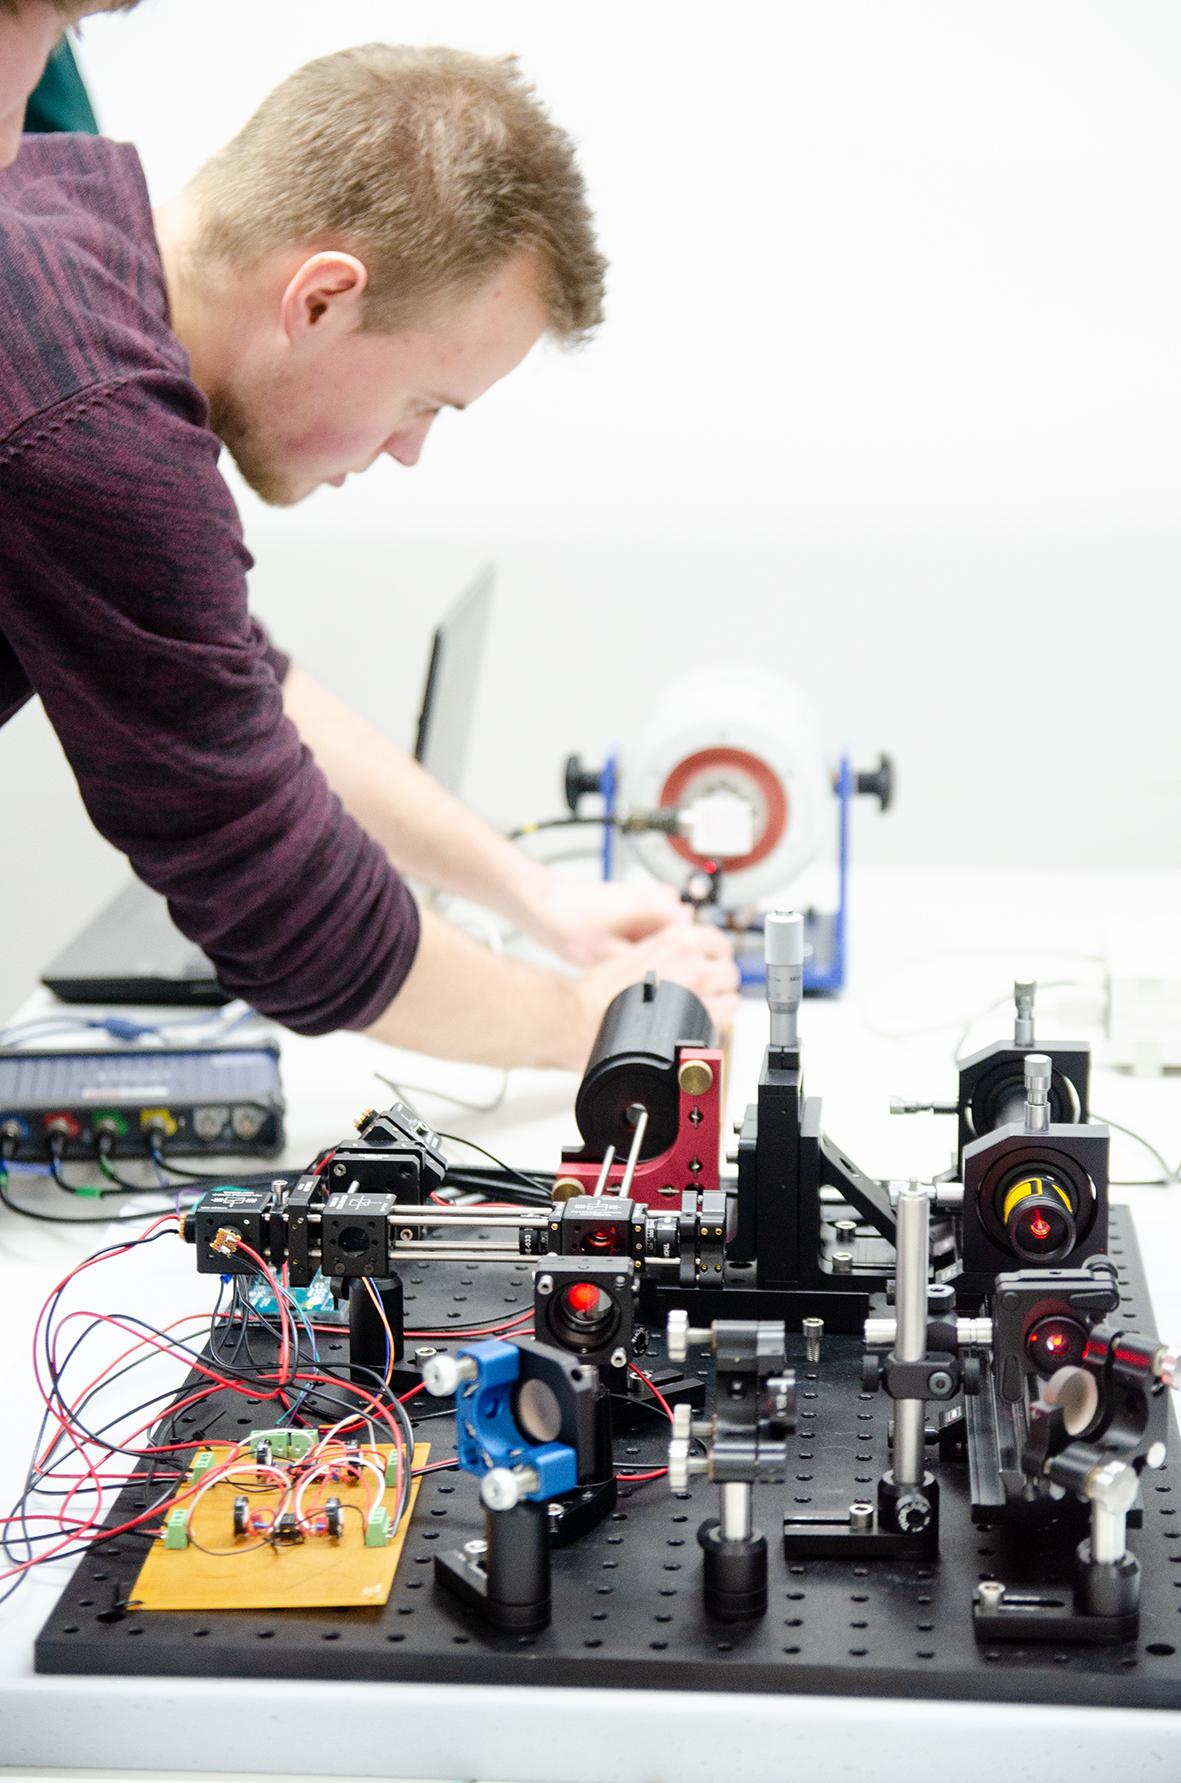 Student arbeitet am Laser-Vibrometer